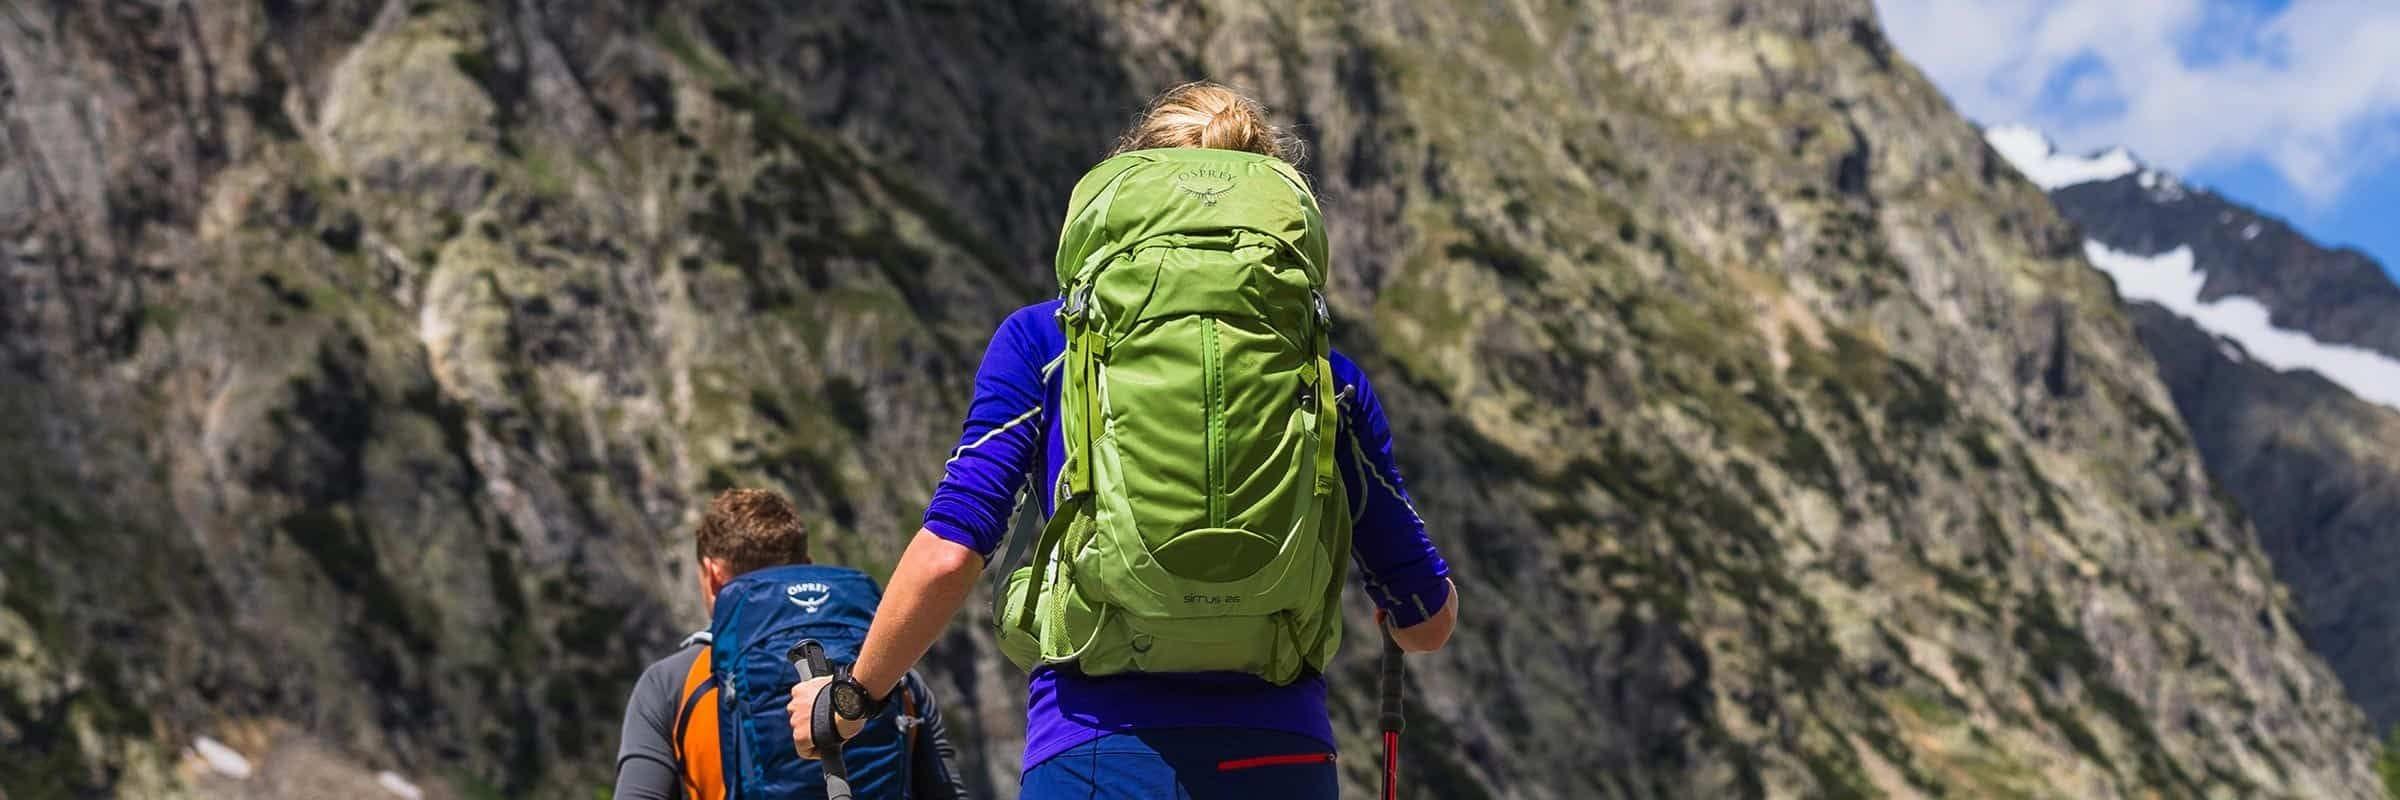 Best Hiking Backpacks in 2021